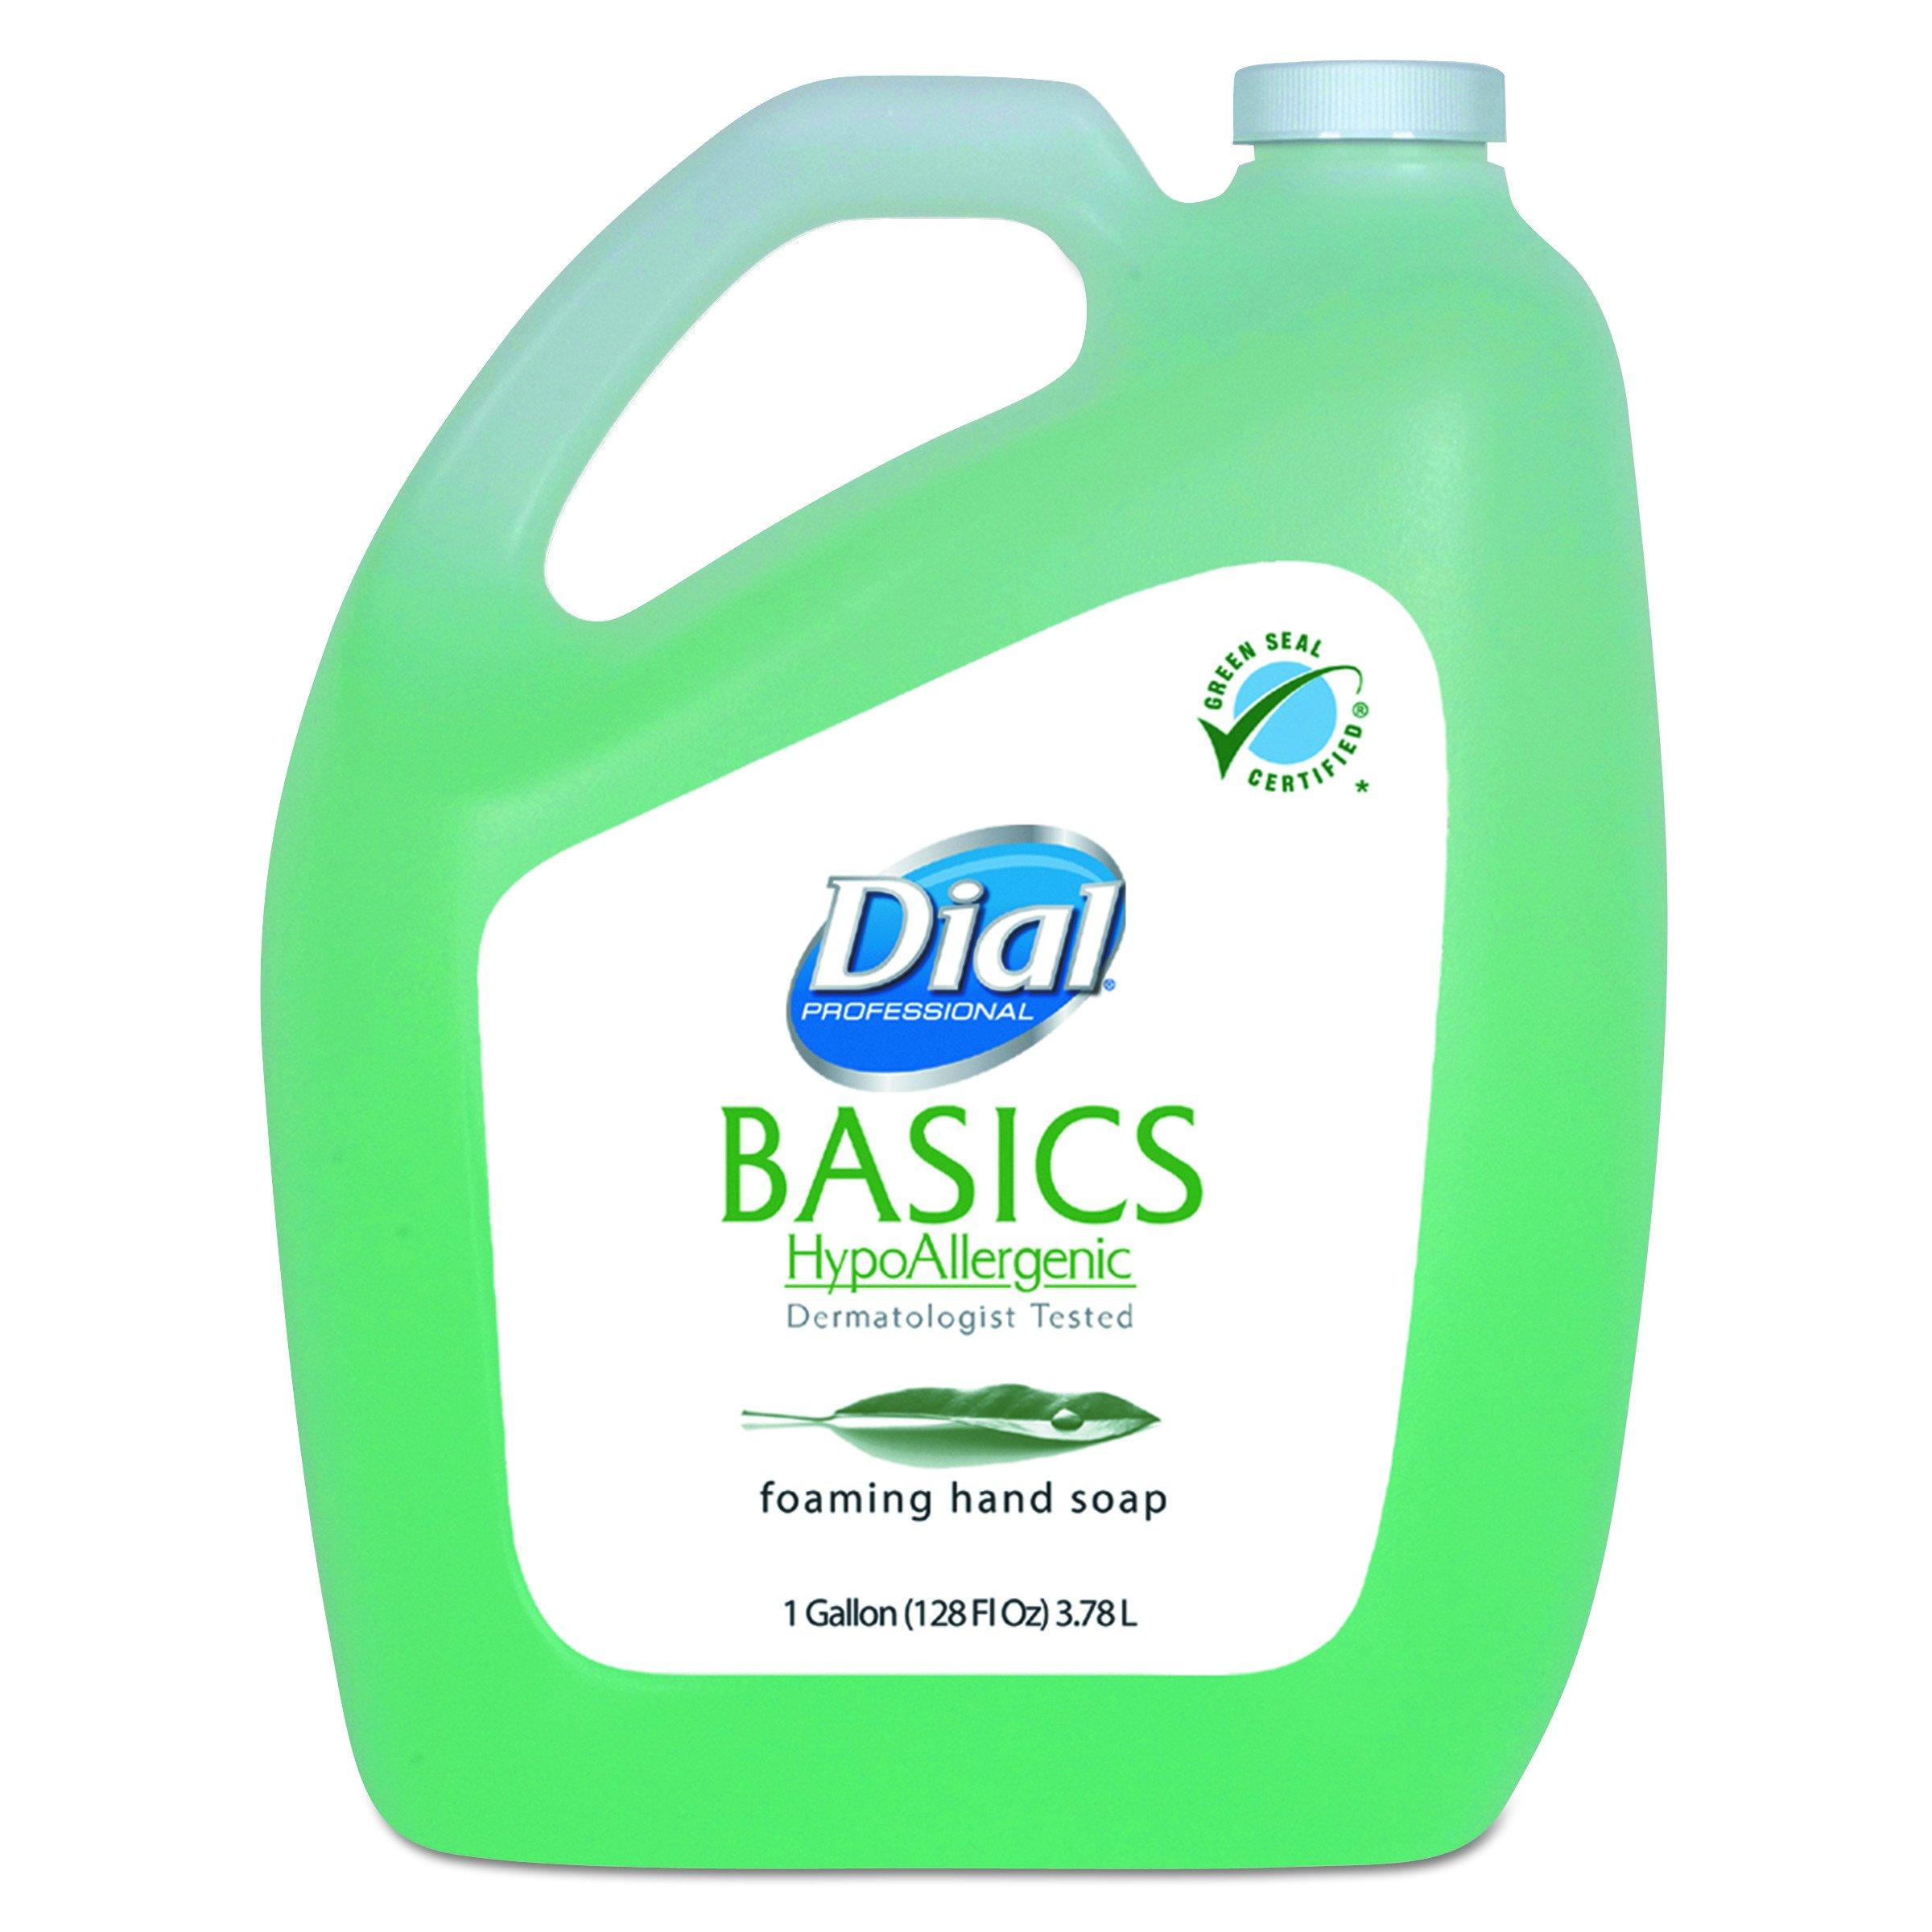 Dial Professional 98612CT Basics Foaming Hand Soap, Original, Honeysuckle, 1 Gallon Bottle (Case of 4 Bottles) by Dial